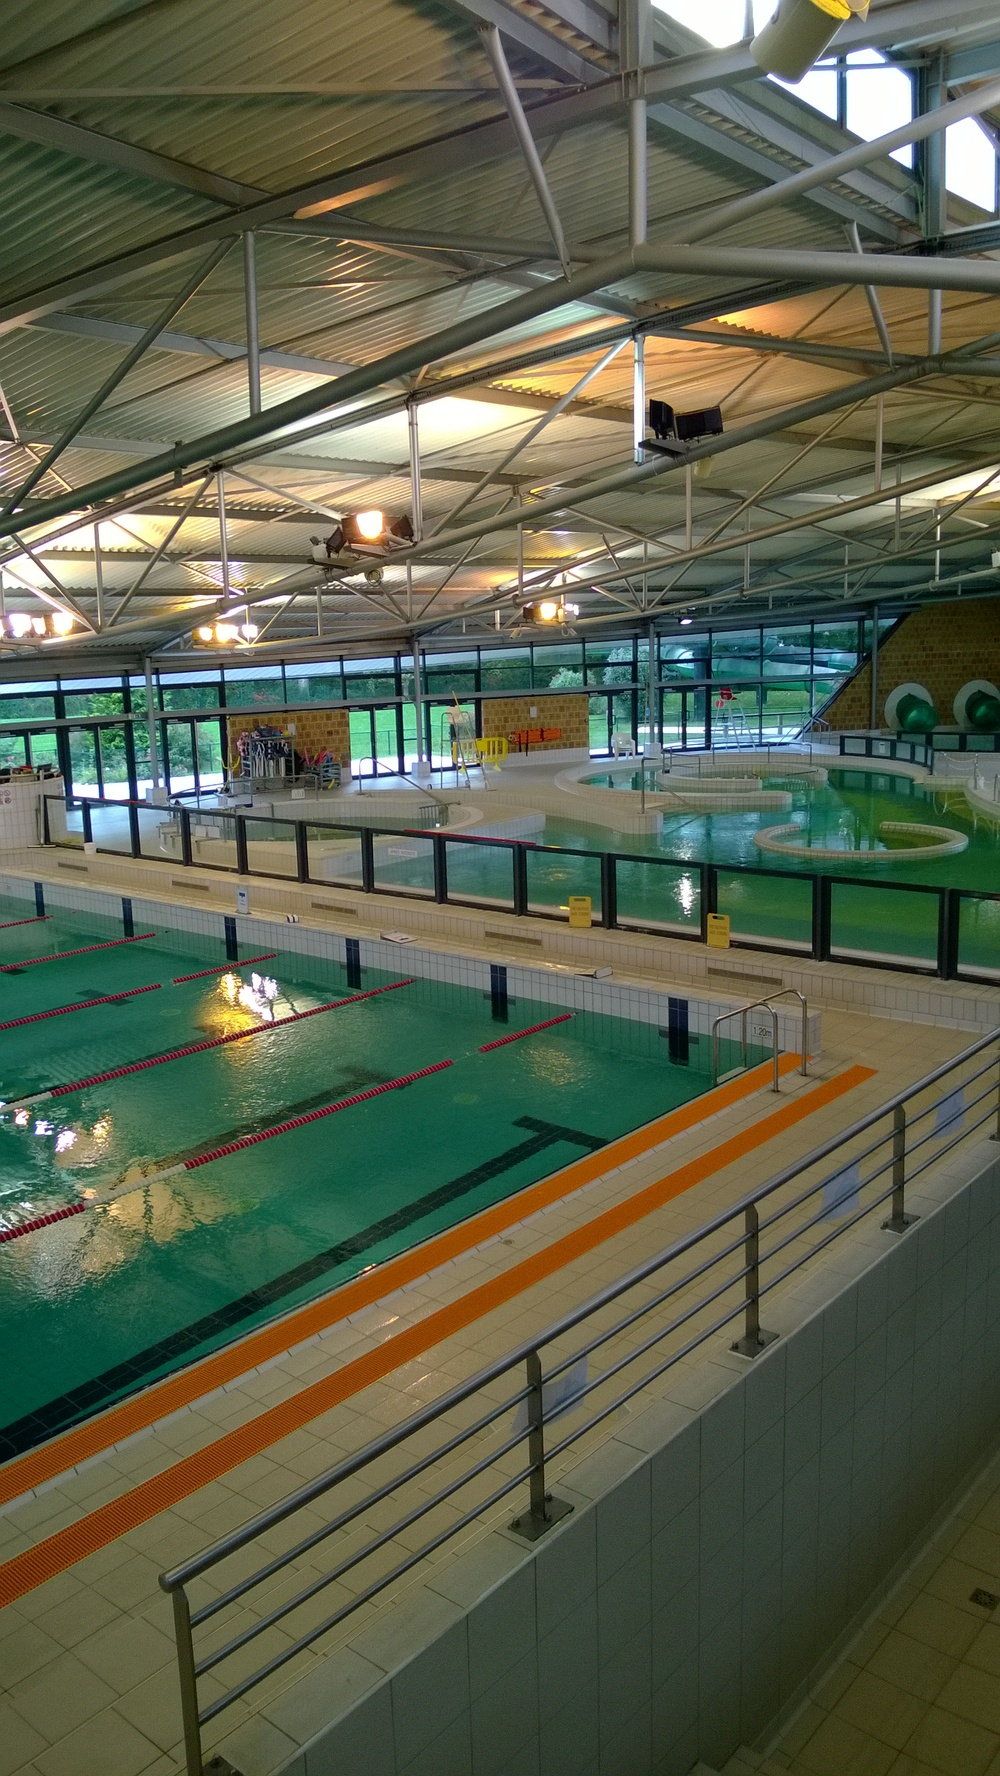 Centre aquatique de montigny le bretonneux nageurscom for Piscine montigny le bretonneux horaires